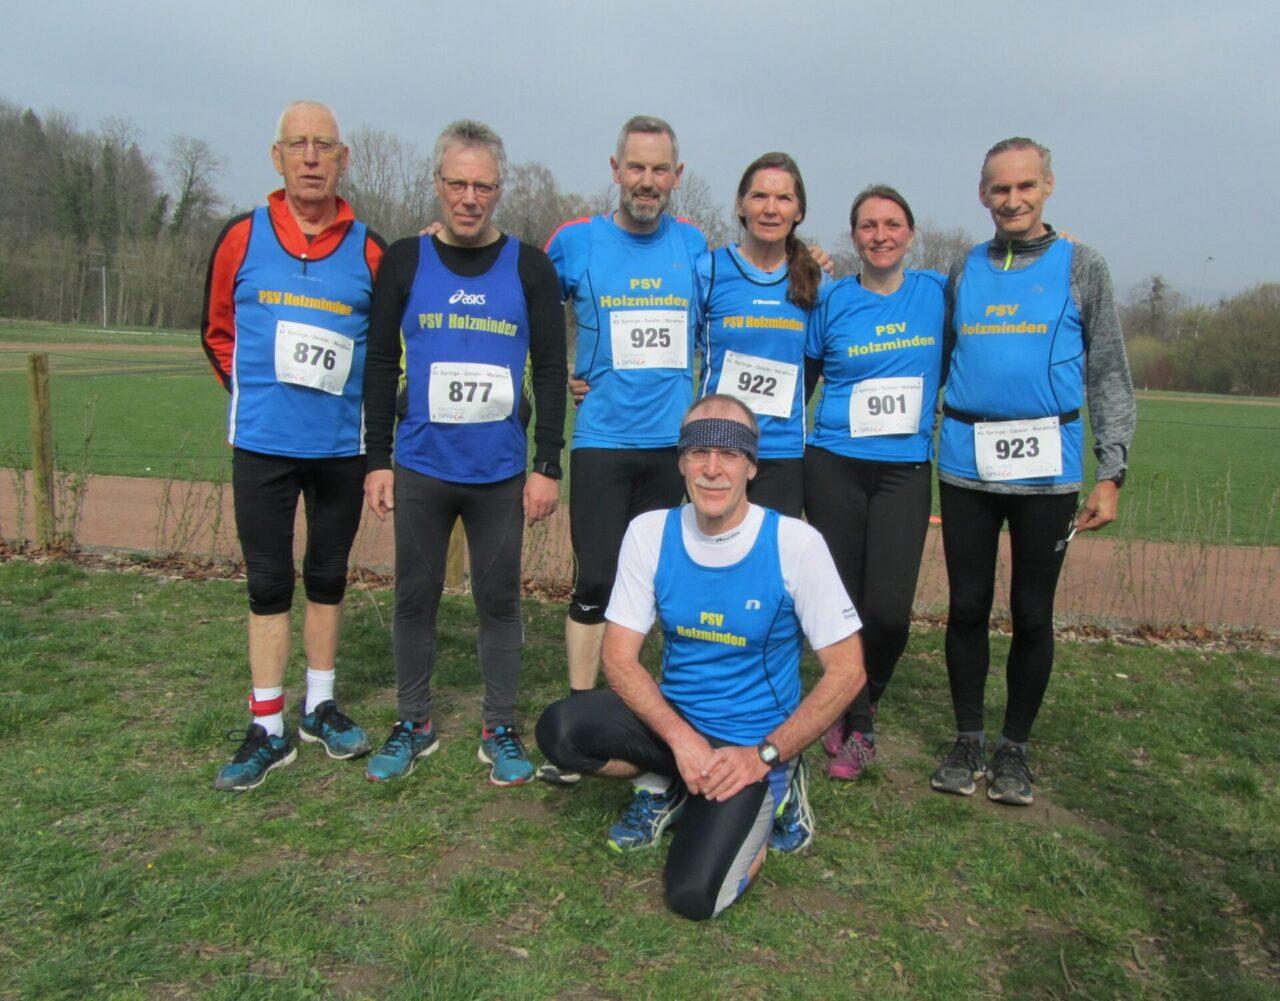 19 43. Springe Deister Marathon 06